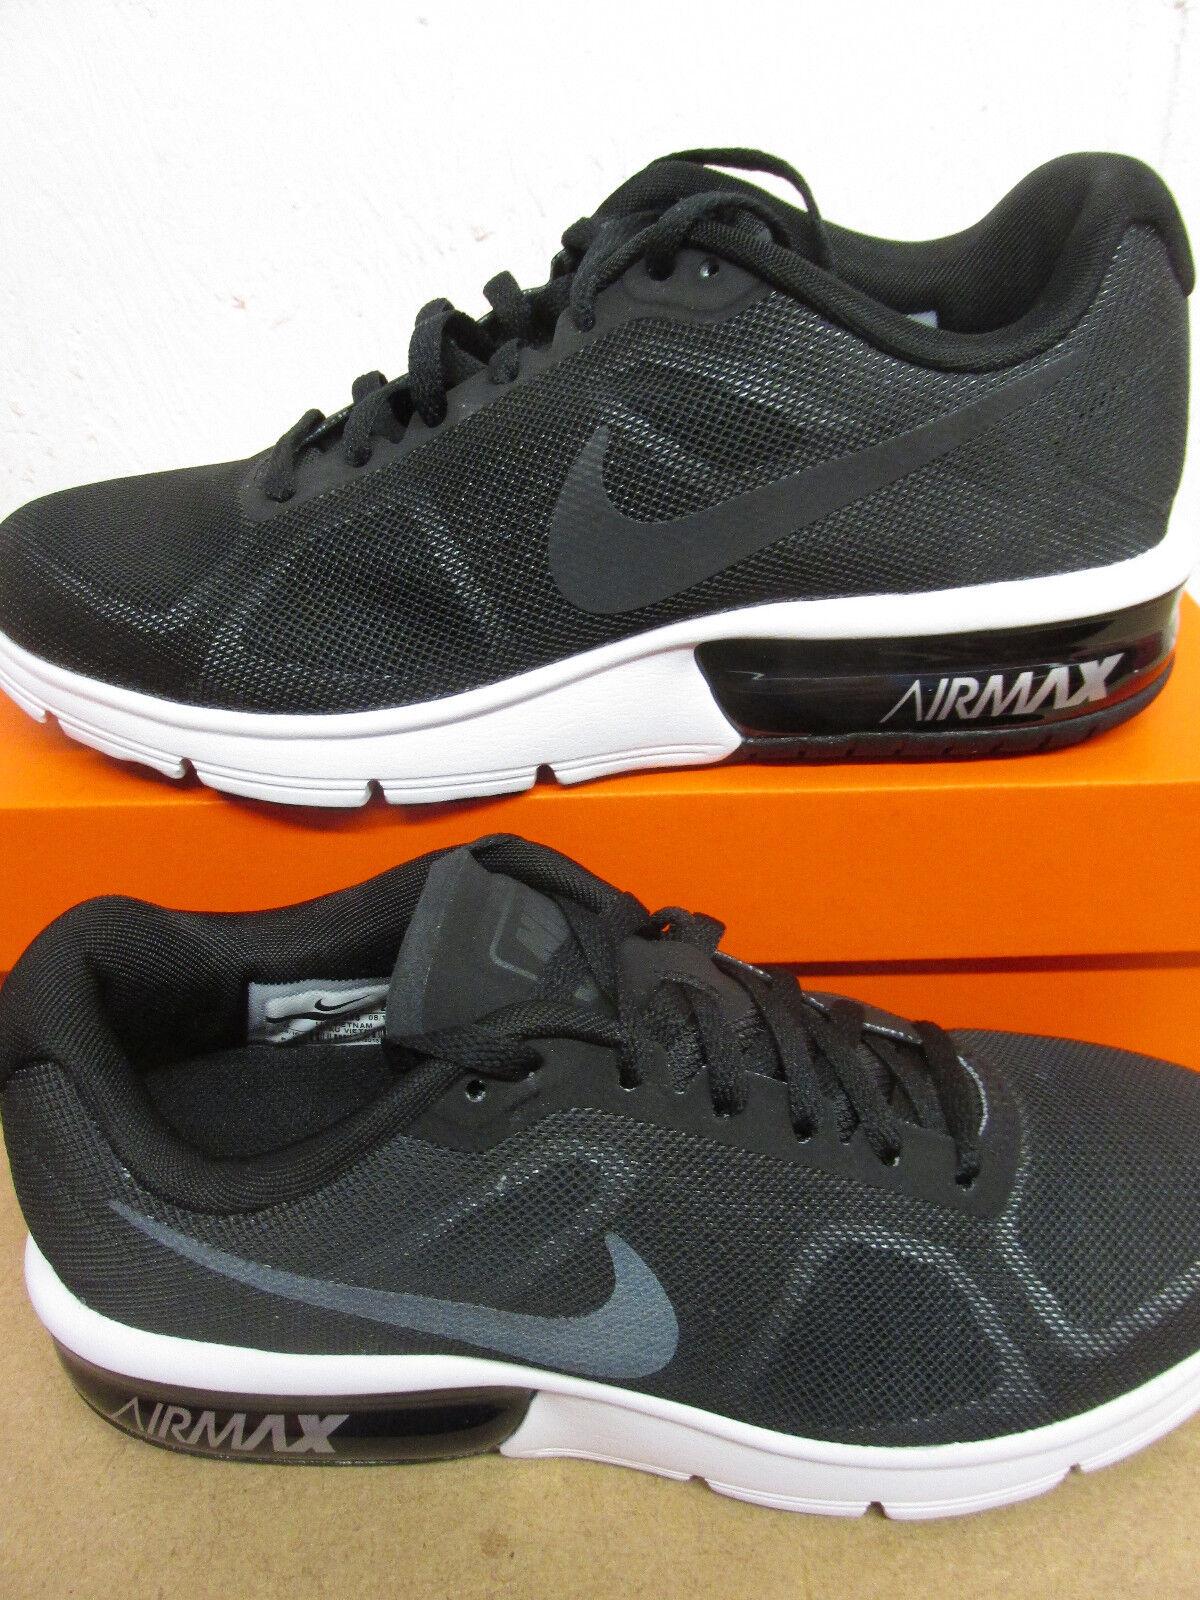 Nike Damen Air Aufeinanderfolgend Max Aufeinanderfolgend Air Laufschuhe 719916 008 Turnschuhe e6fec5